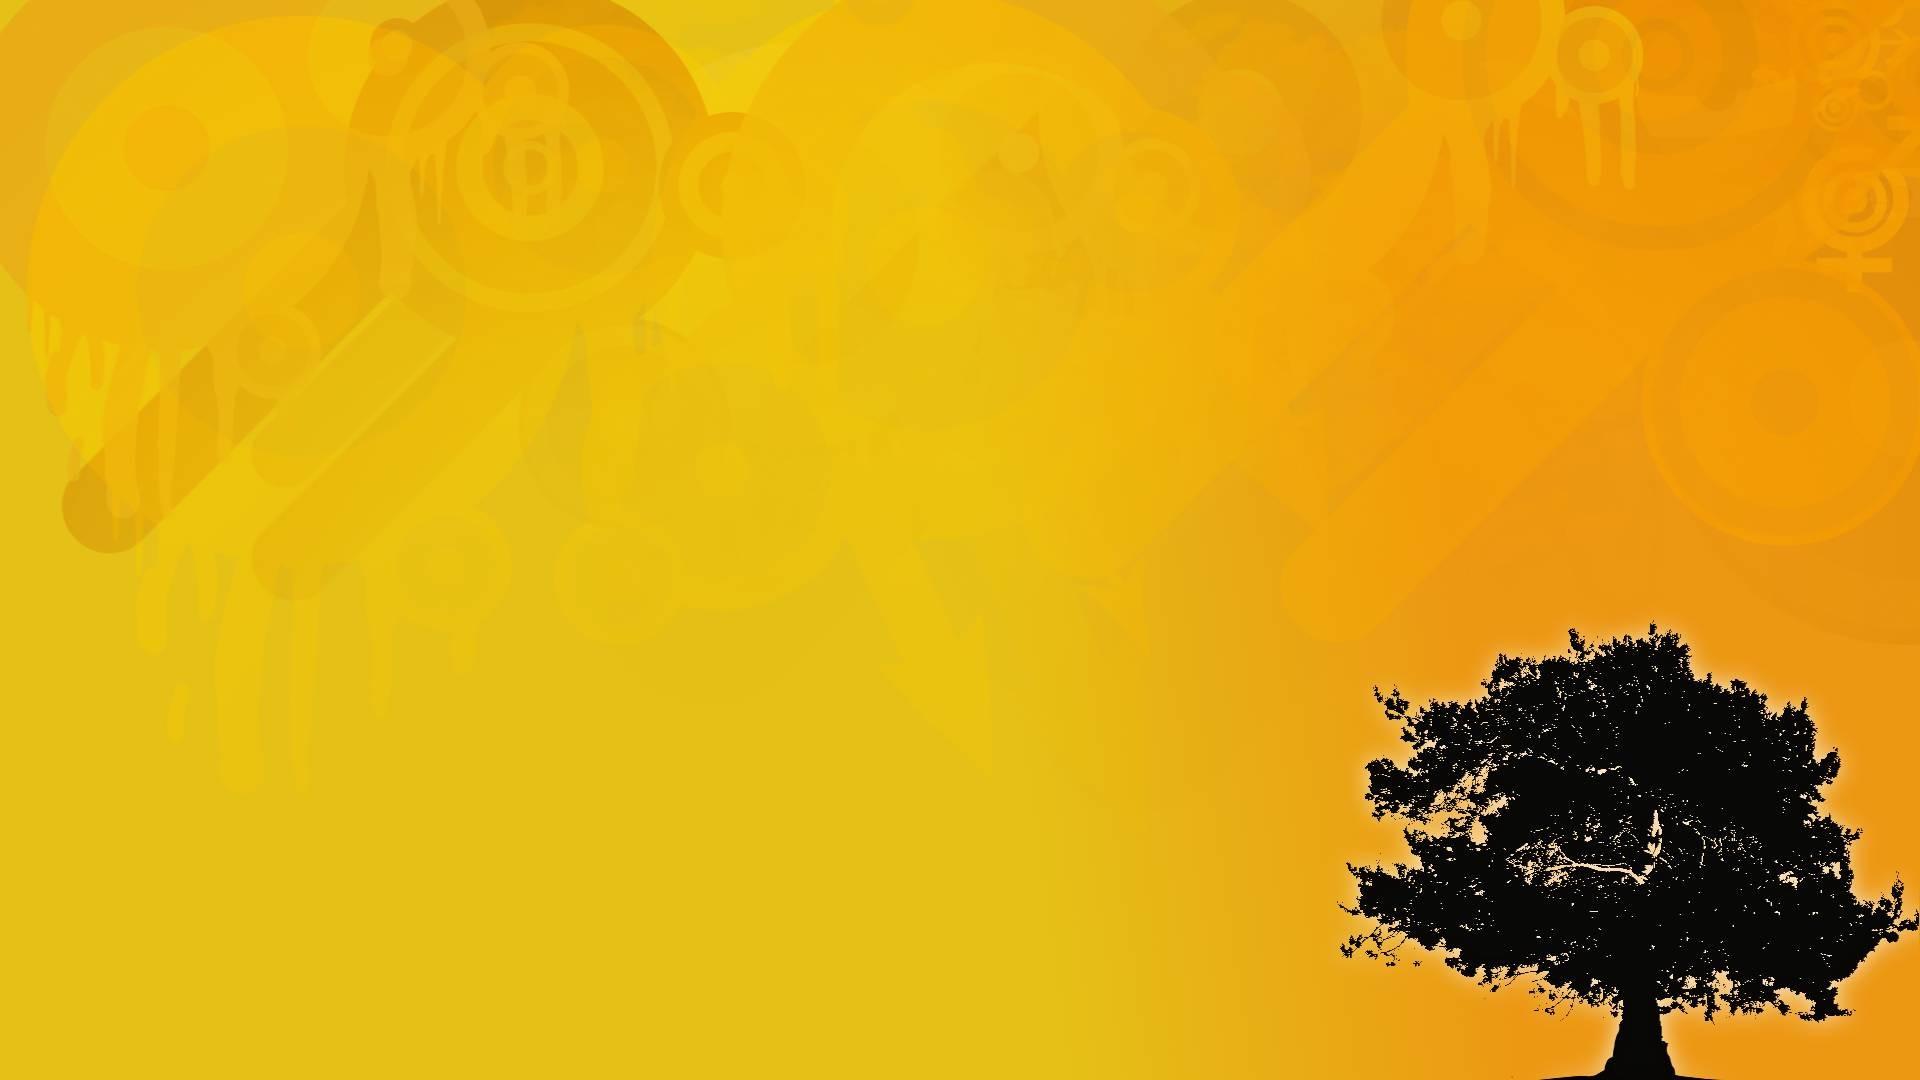 Pubg Logo Texture: 基督徒墙纸大全1-基督教壁纸图片站主内图片大全 基督徒 壁纸 教会 标志 QQ表情 素材